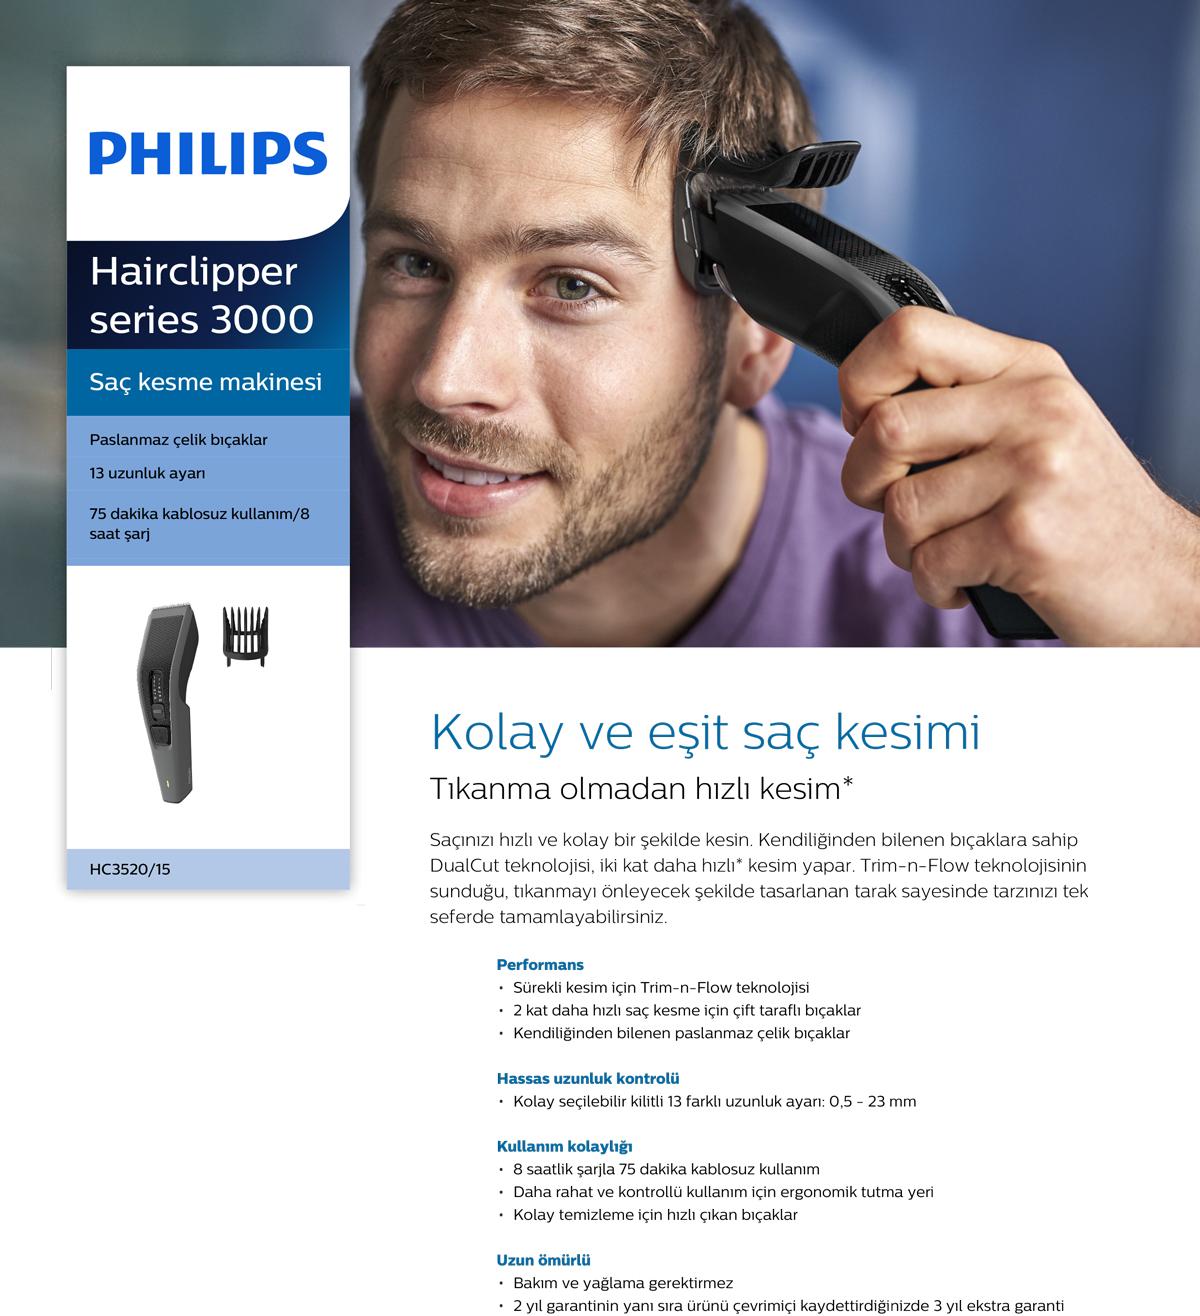 Philips 3000 Serisi Hc3520 15 Sac Kesme Makinesi Fiyatlari Ve